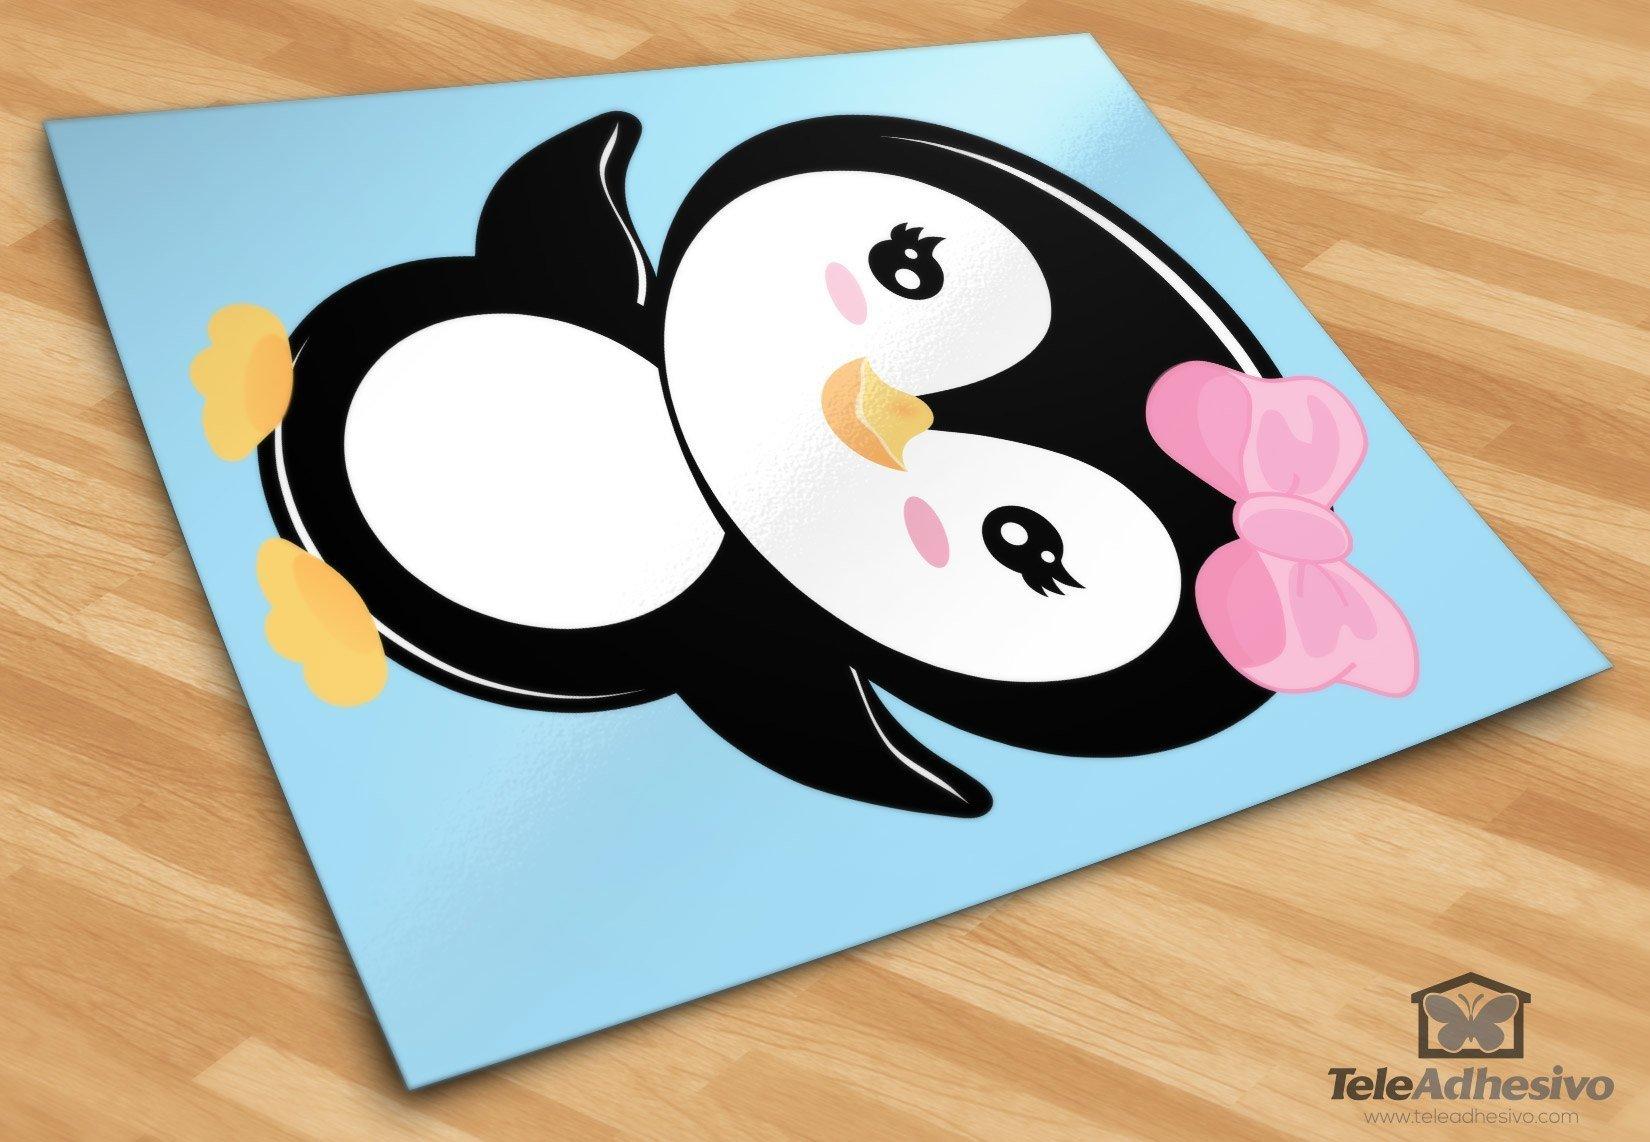 Kinderzimmer Wandtattoo: Penguin rosen Schleife